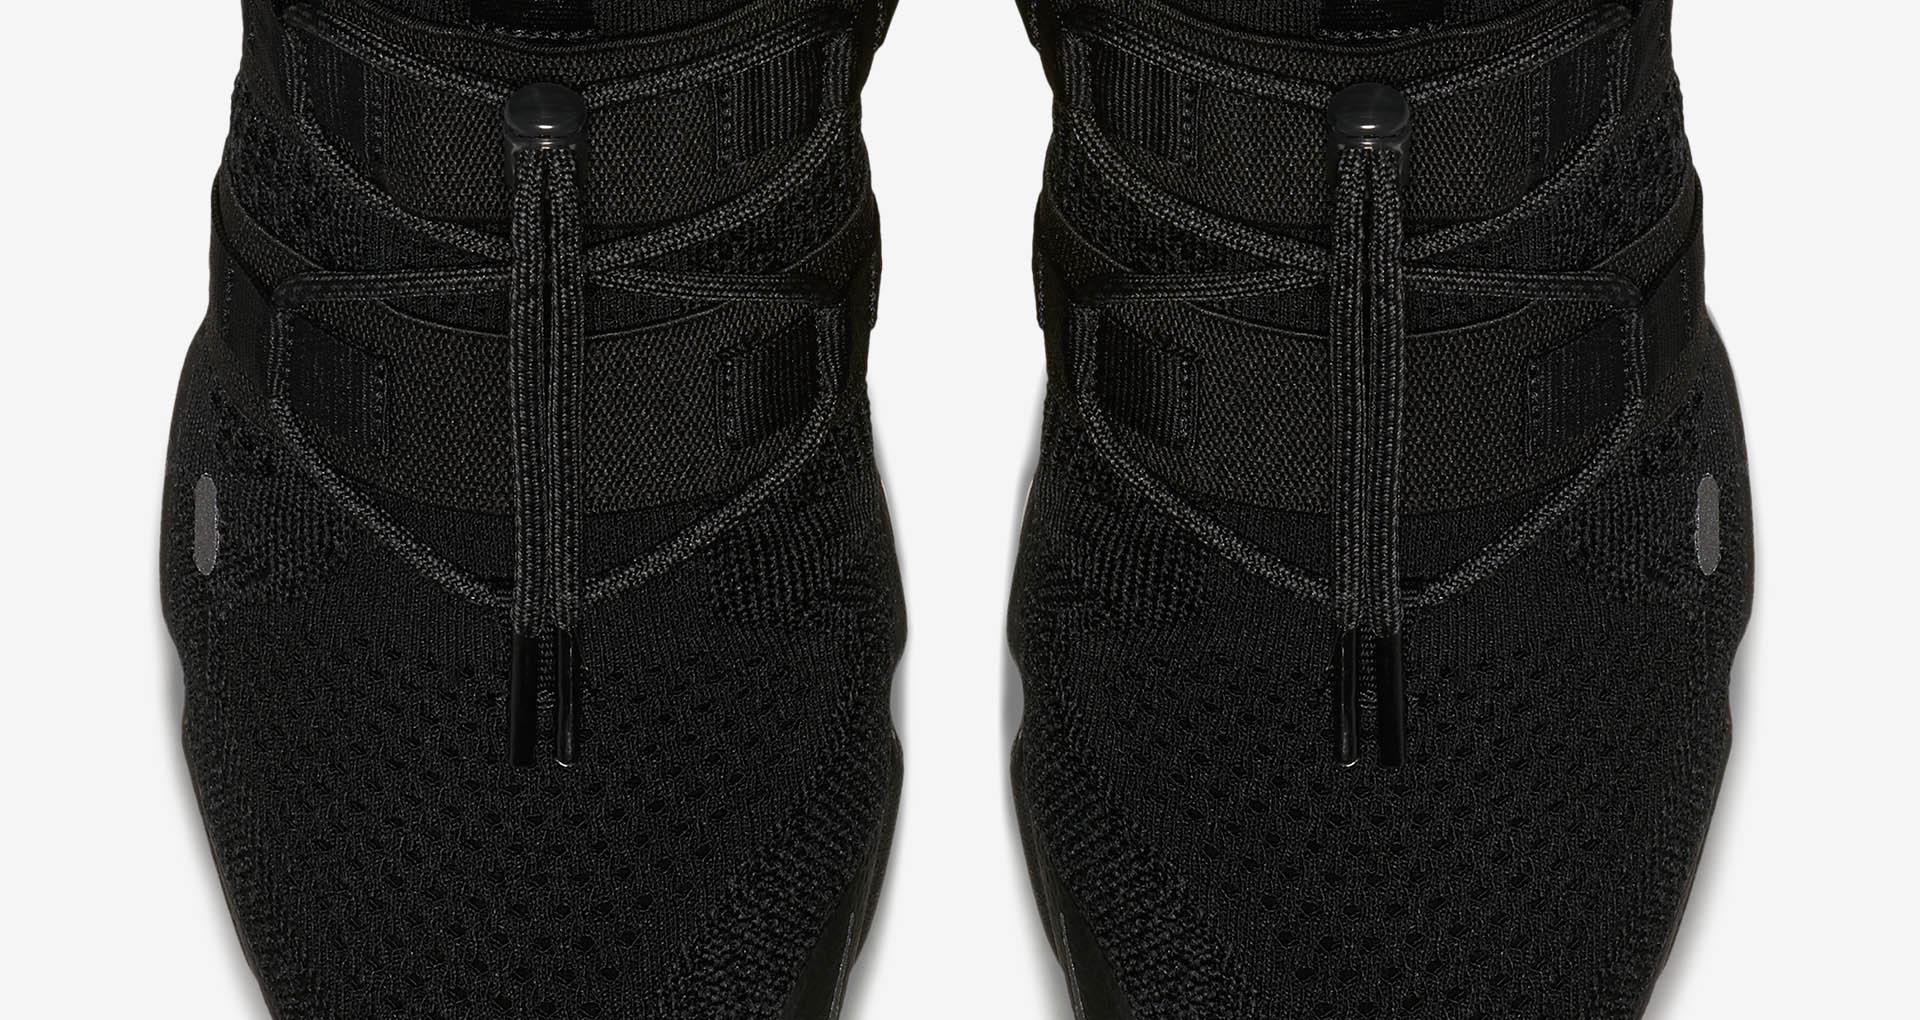 new product 9eb08 66dc9 Nike Unveils the Air VaporMax Utility 'Maximum Black ...